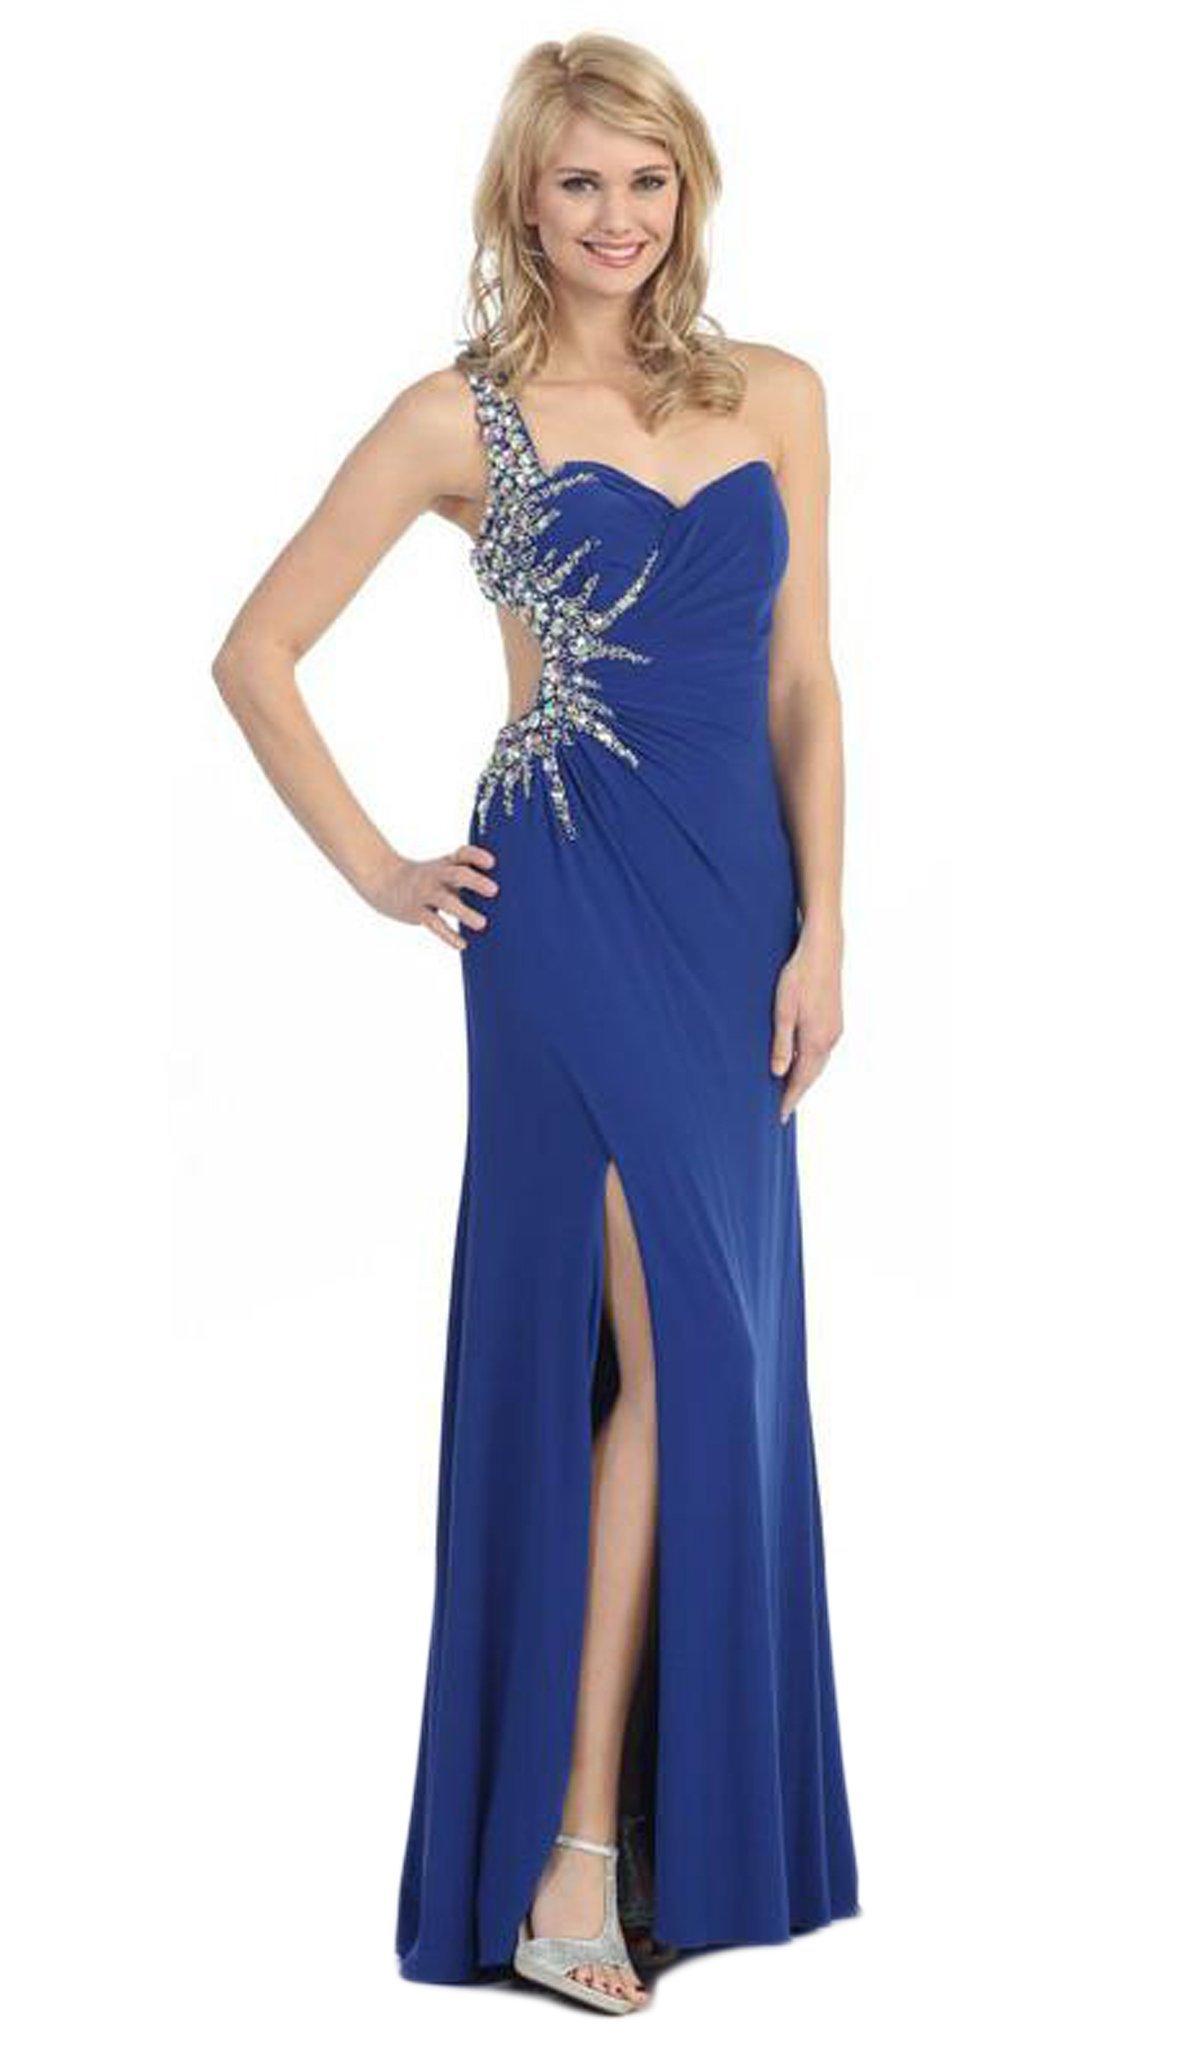 Eureka Fashion - 2501 Beaded Sweetheart Jersey Sheath Dress